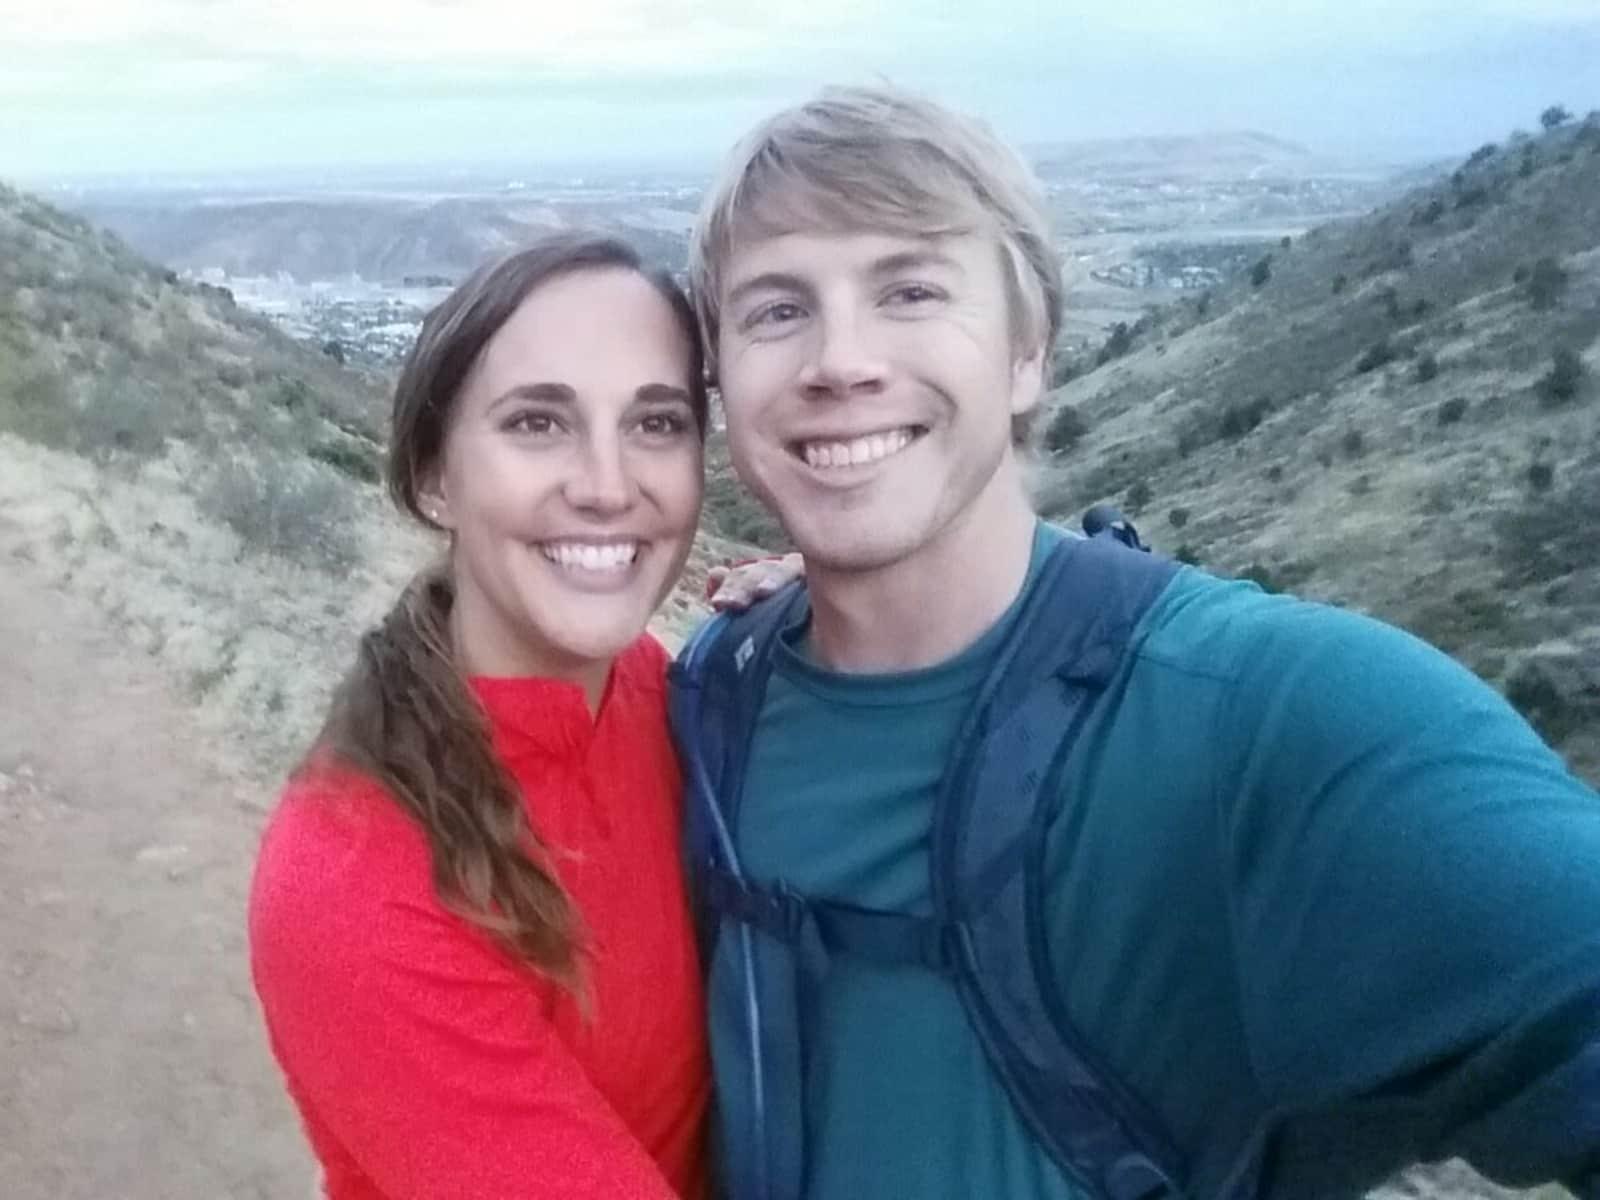 Jason & Nicole from Golden, Colorado, United States